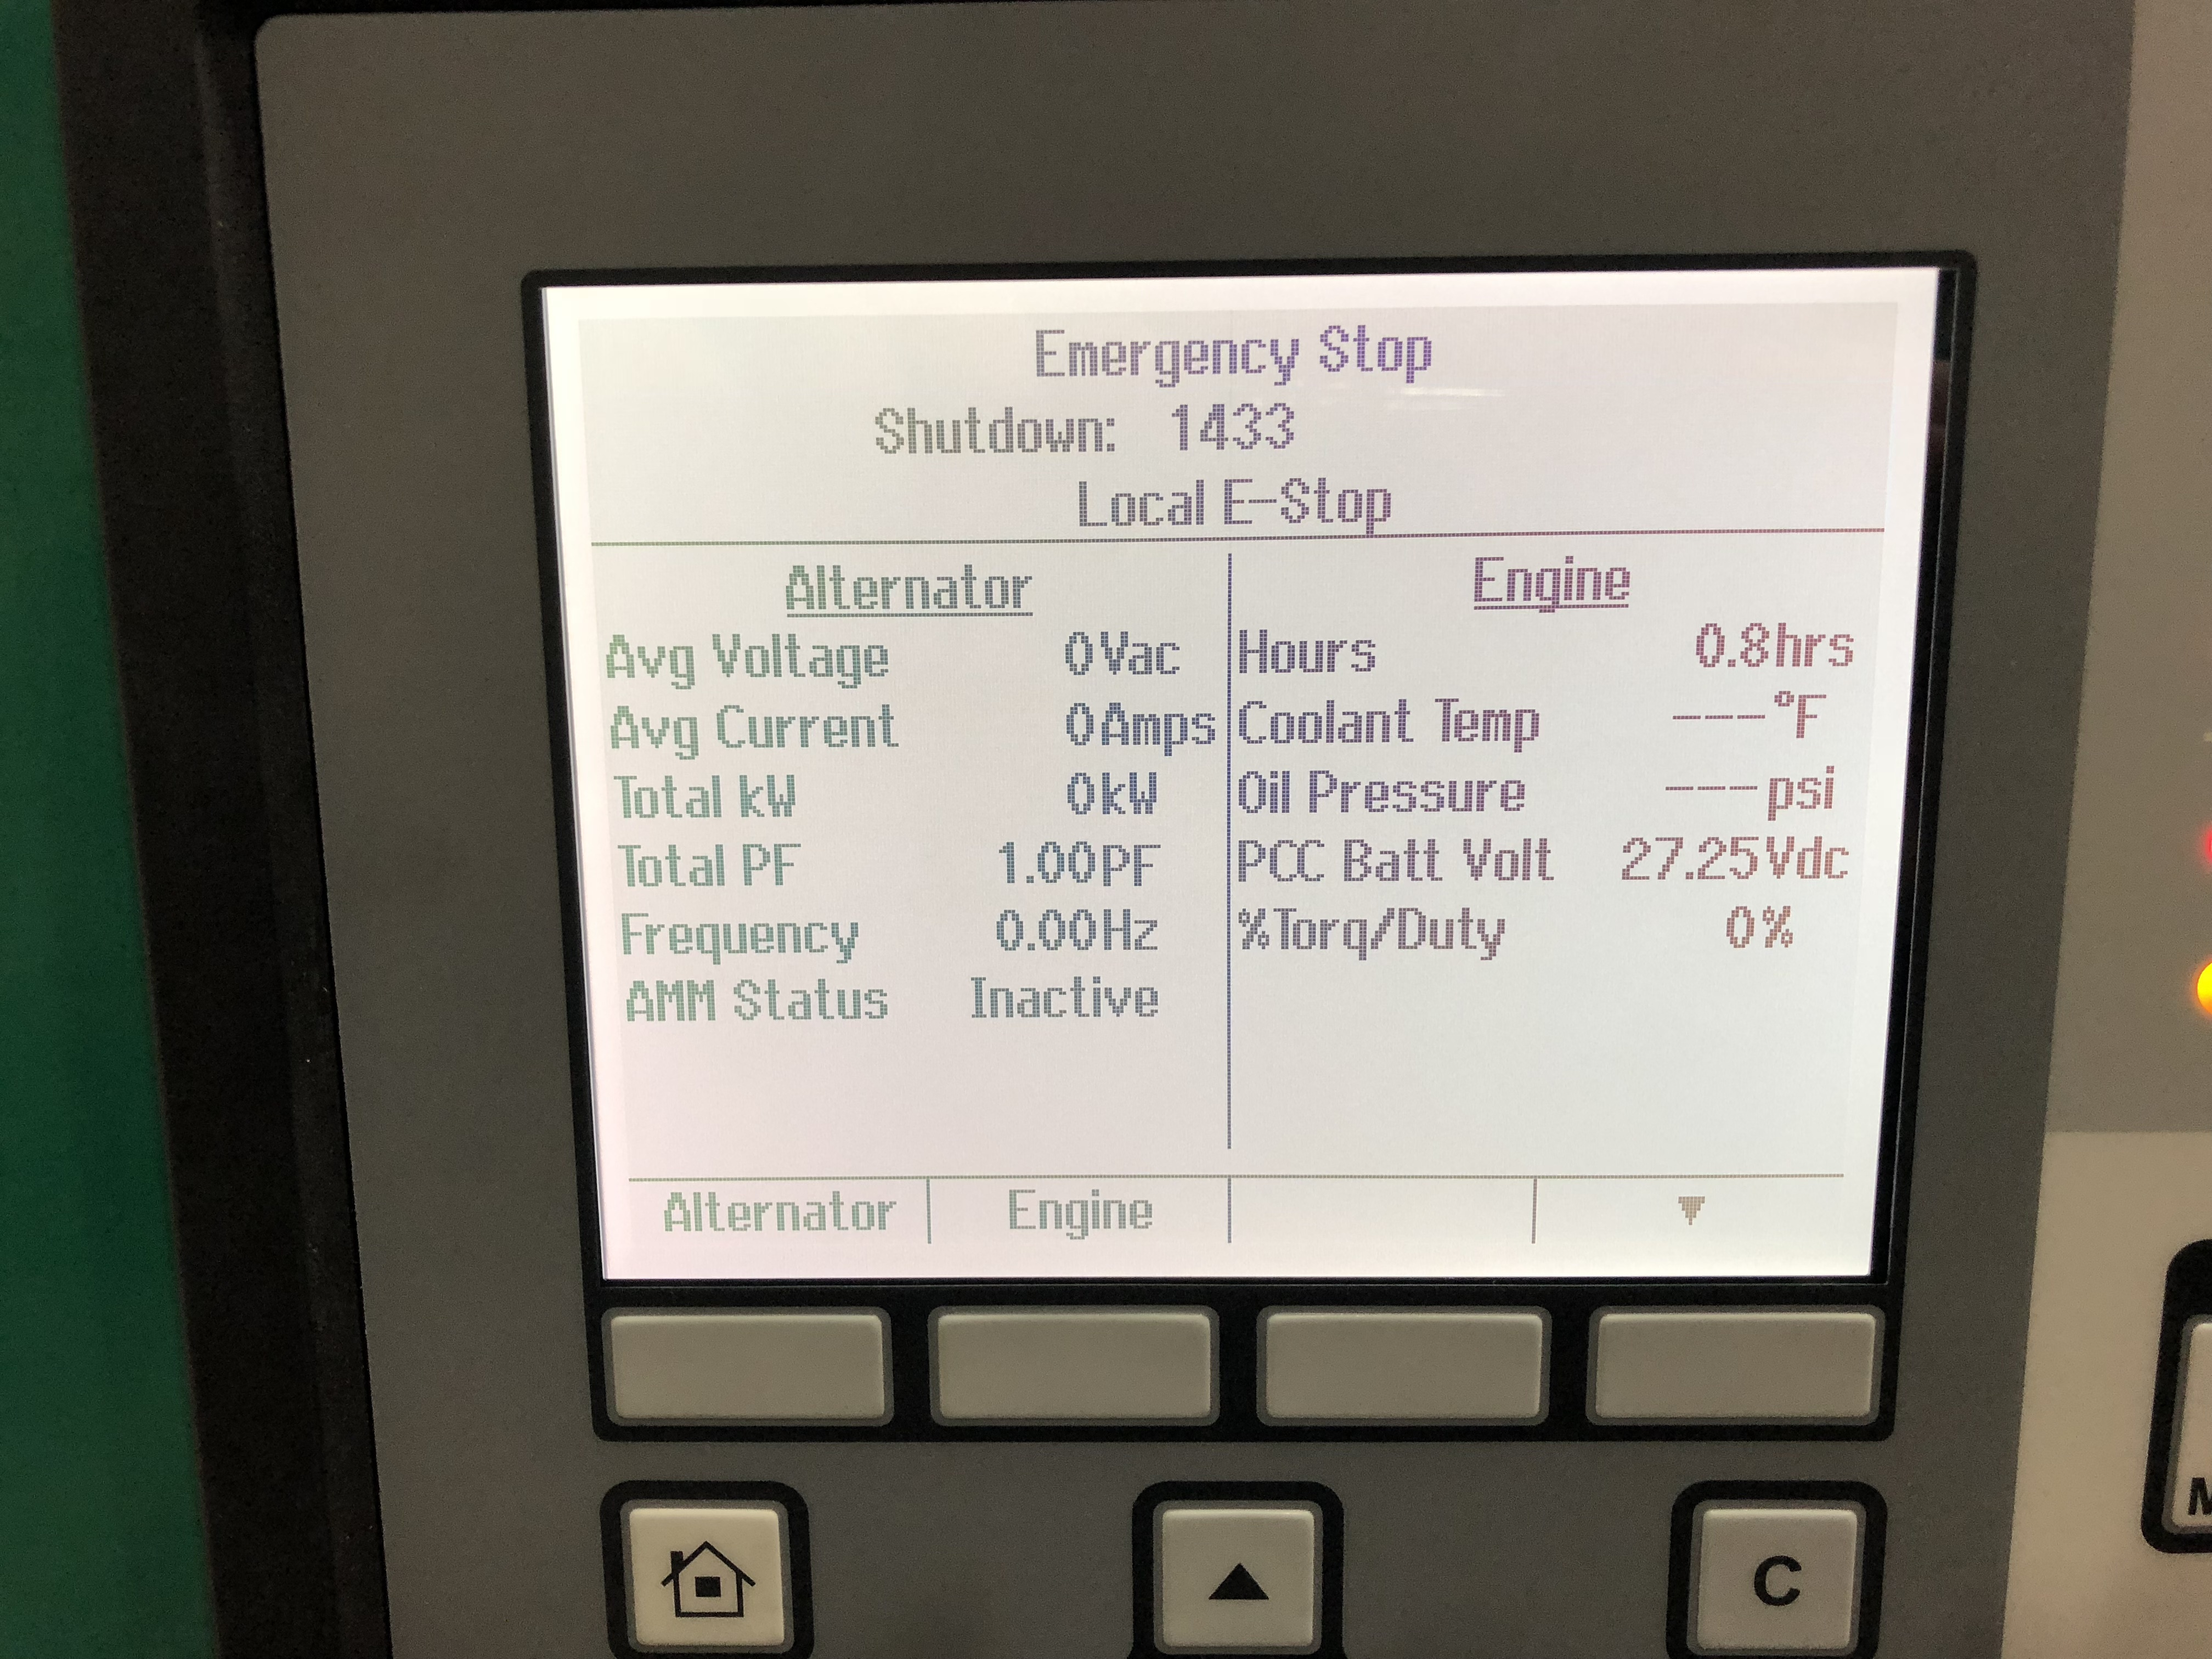 New Cummins Qsx15 G9 Nr2 Diesel Generator Epa Tier 2 500 Kw Wiring Diagram 69950 Price Csdg